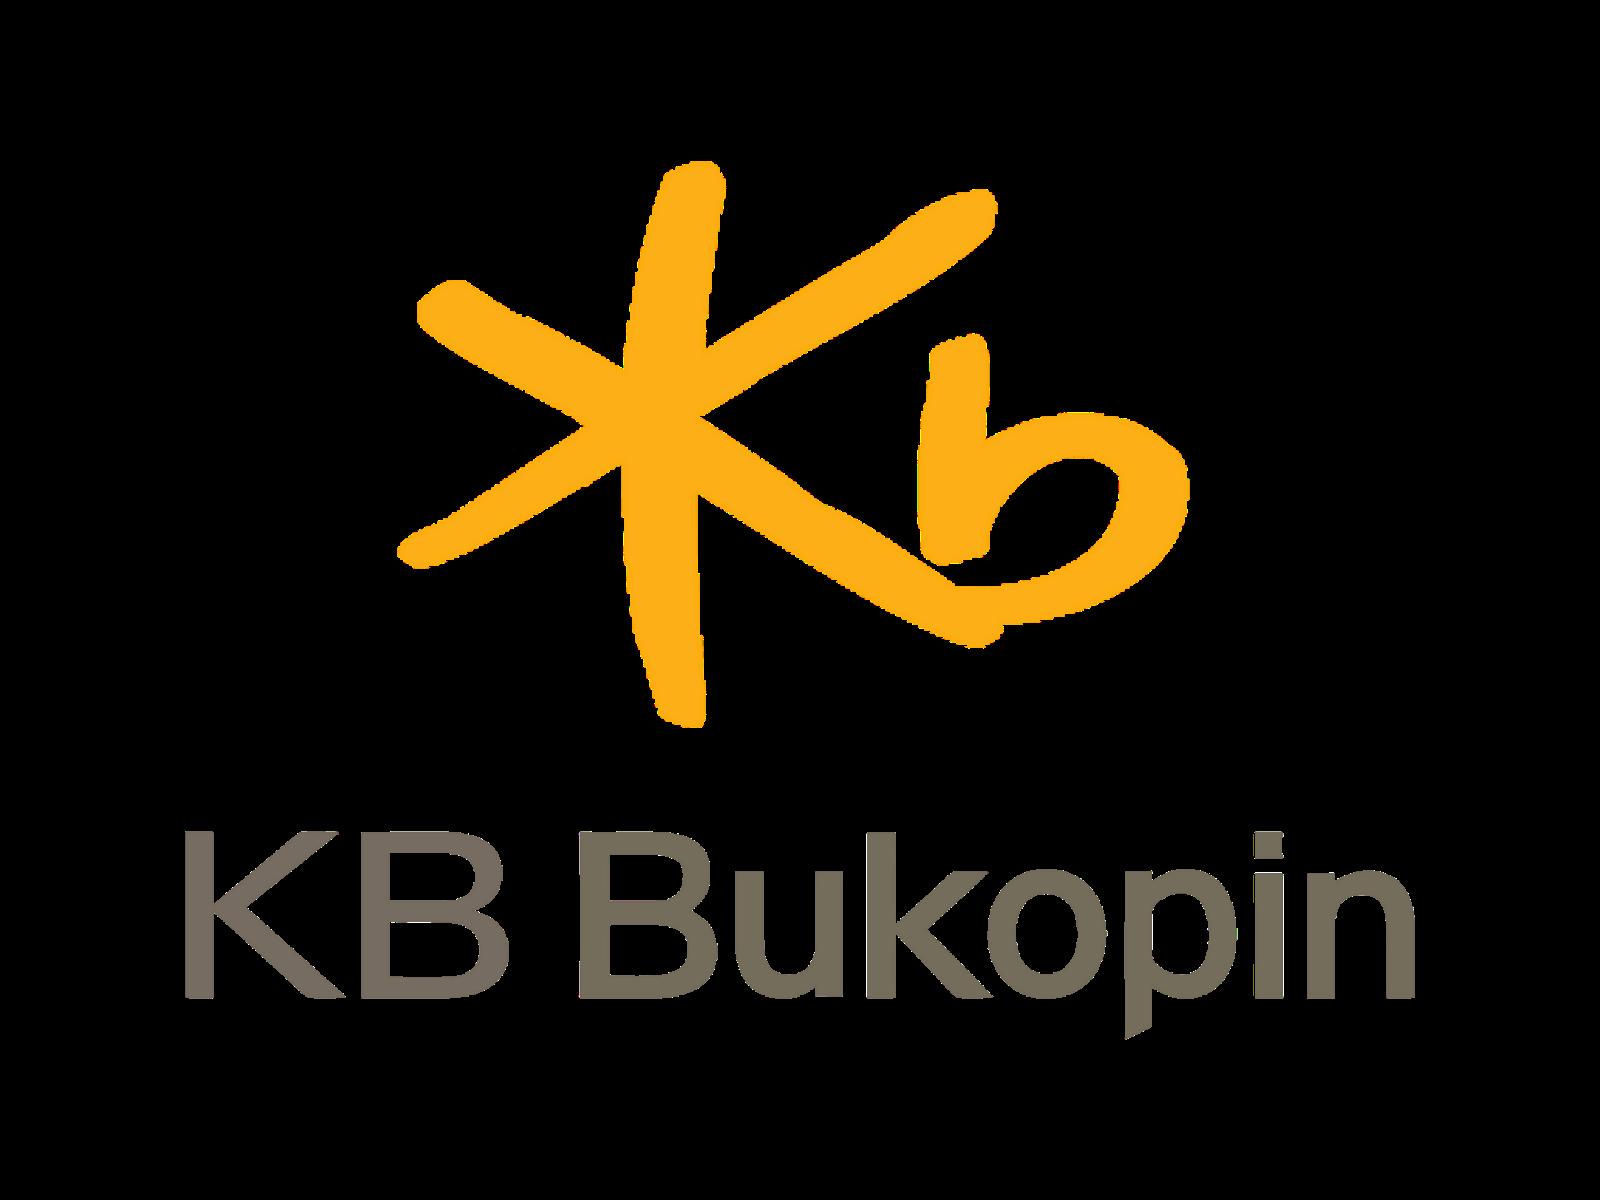 Logo KB Bukopin Format PNG